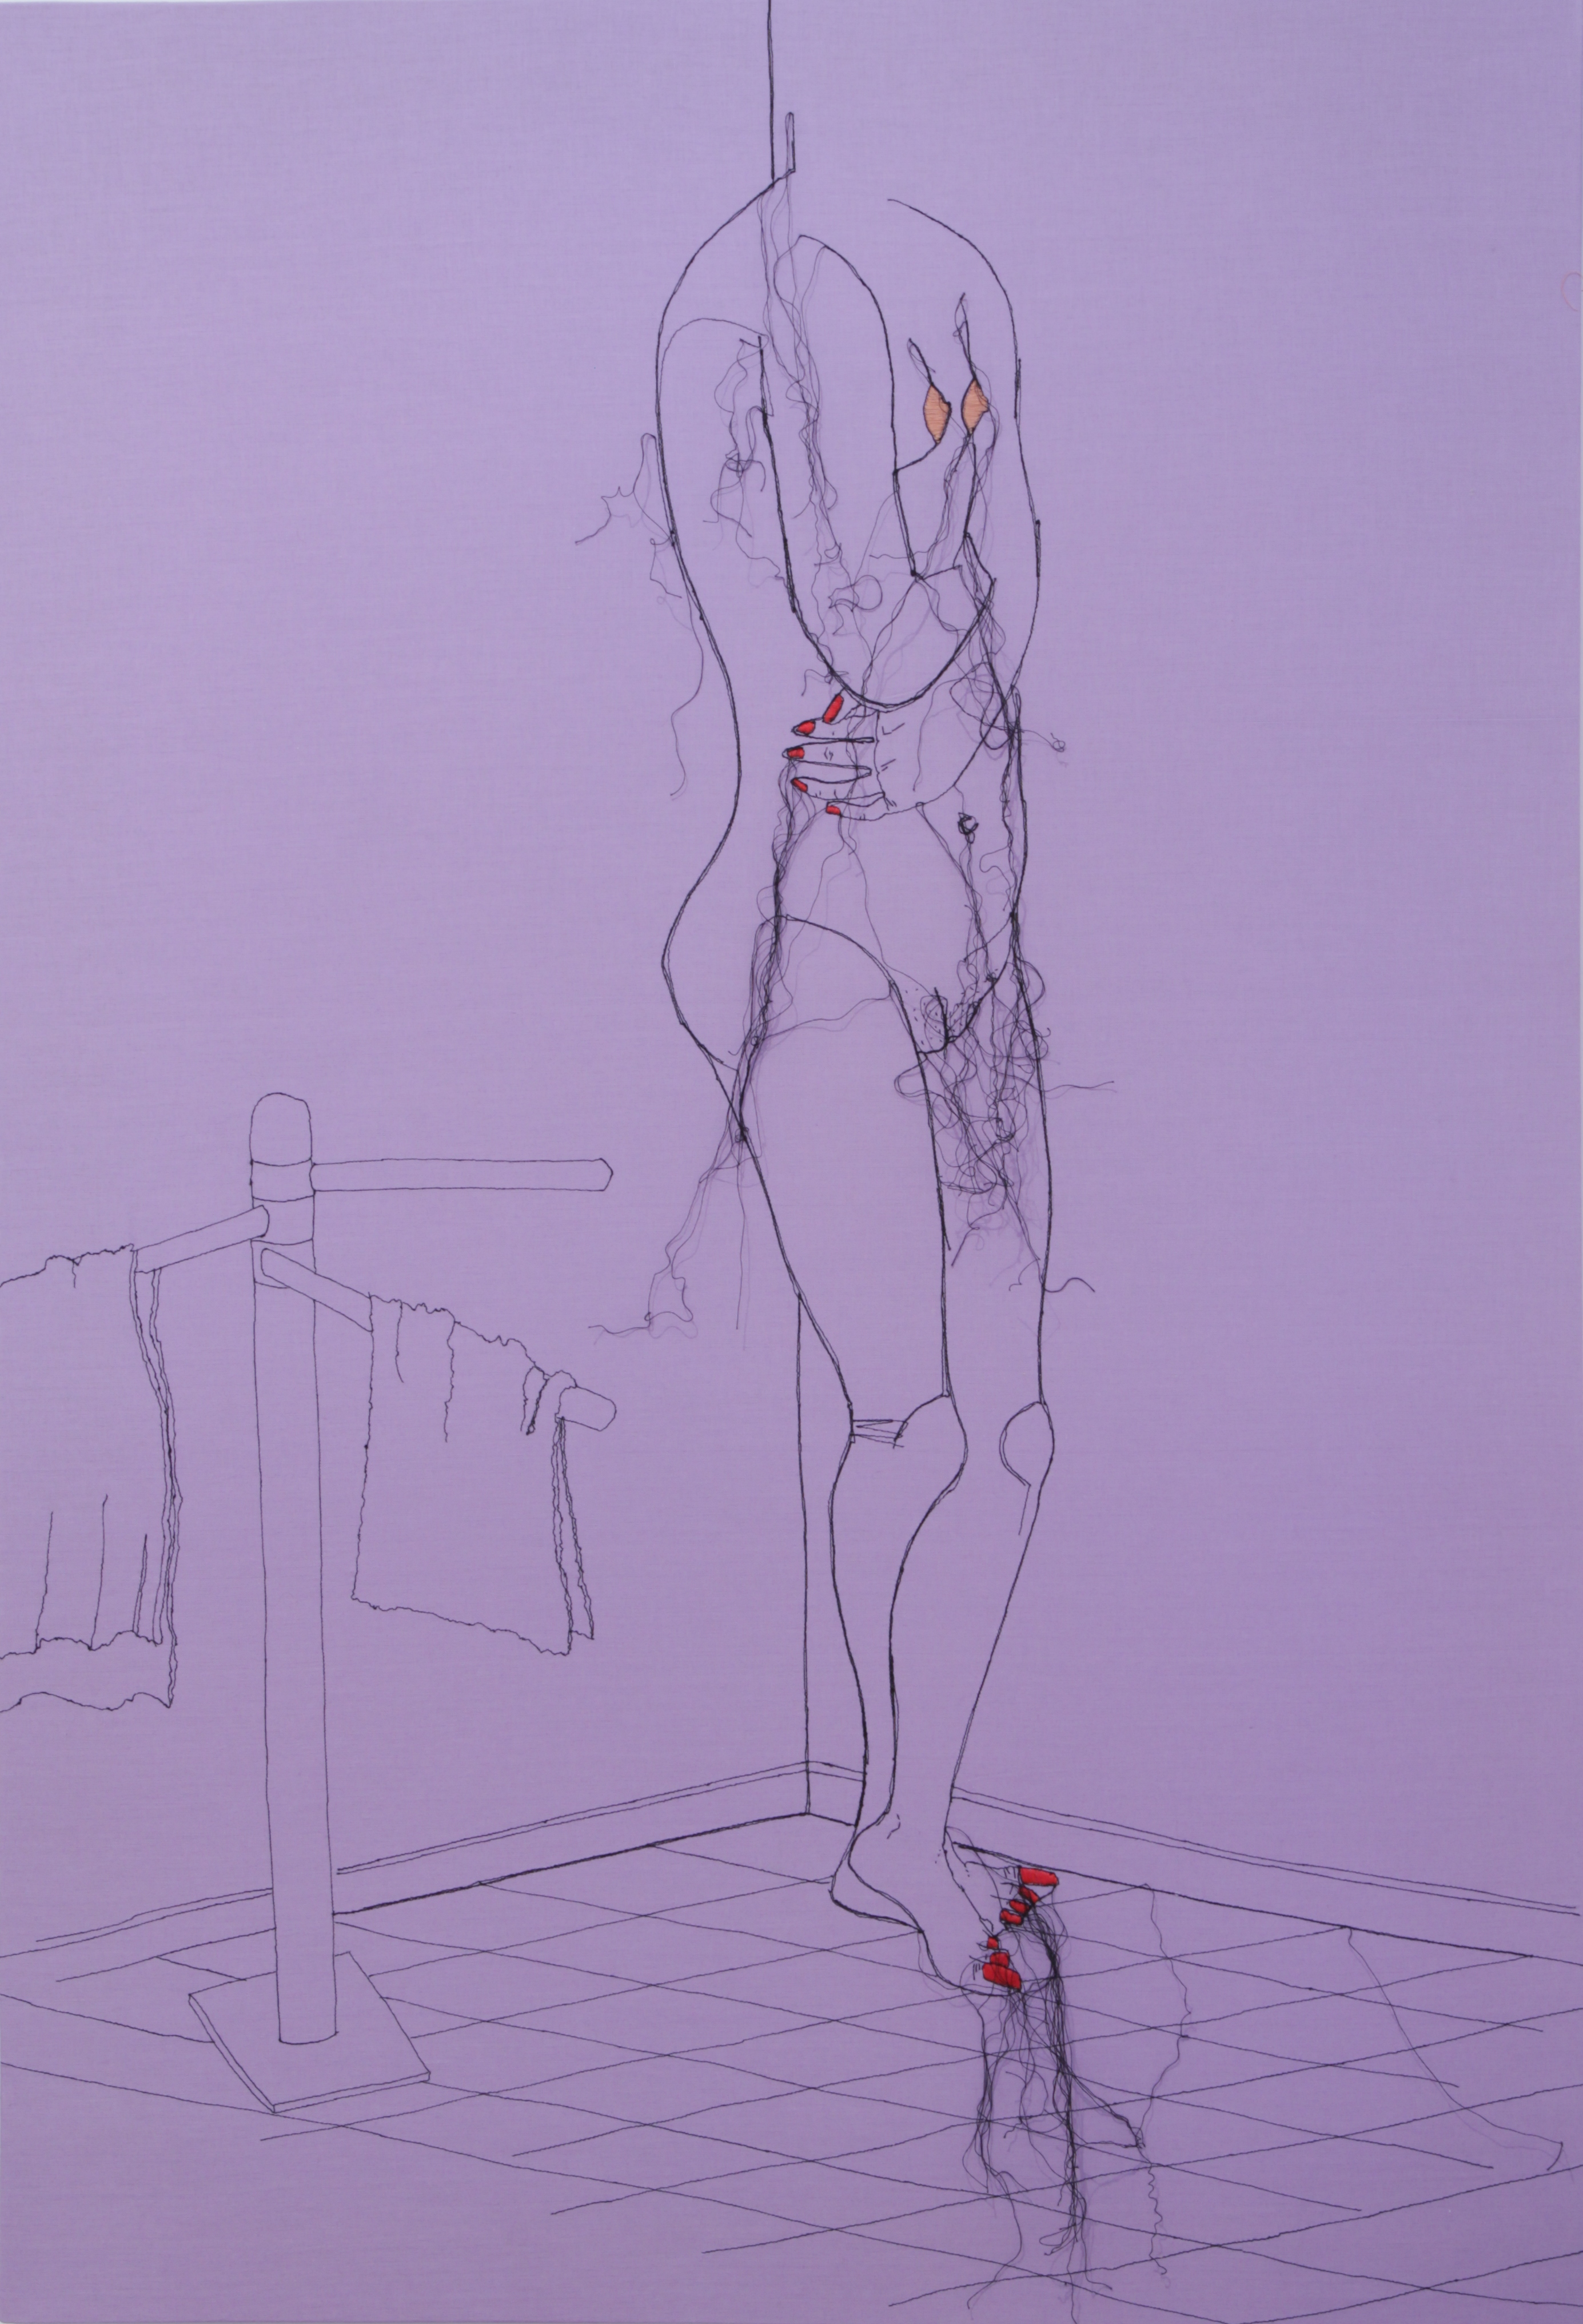 Frame # 3 - Signorina